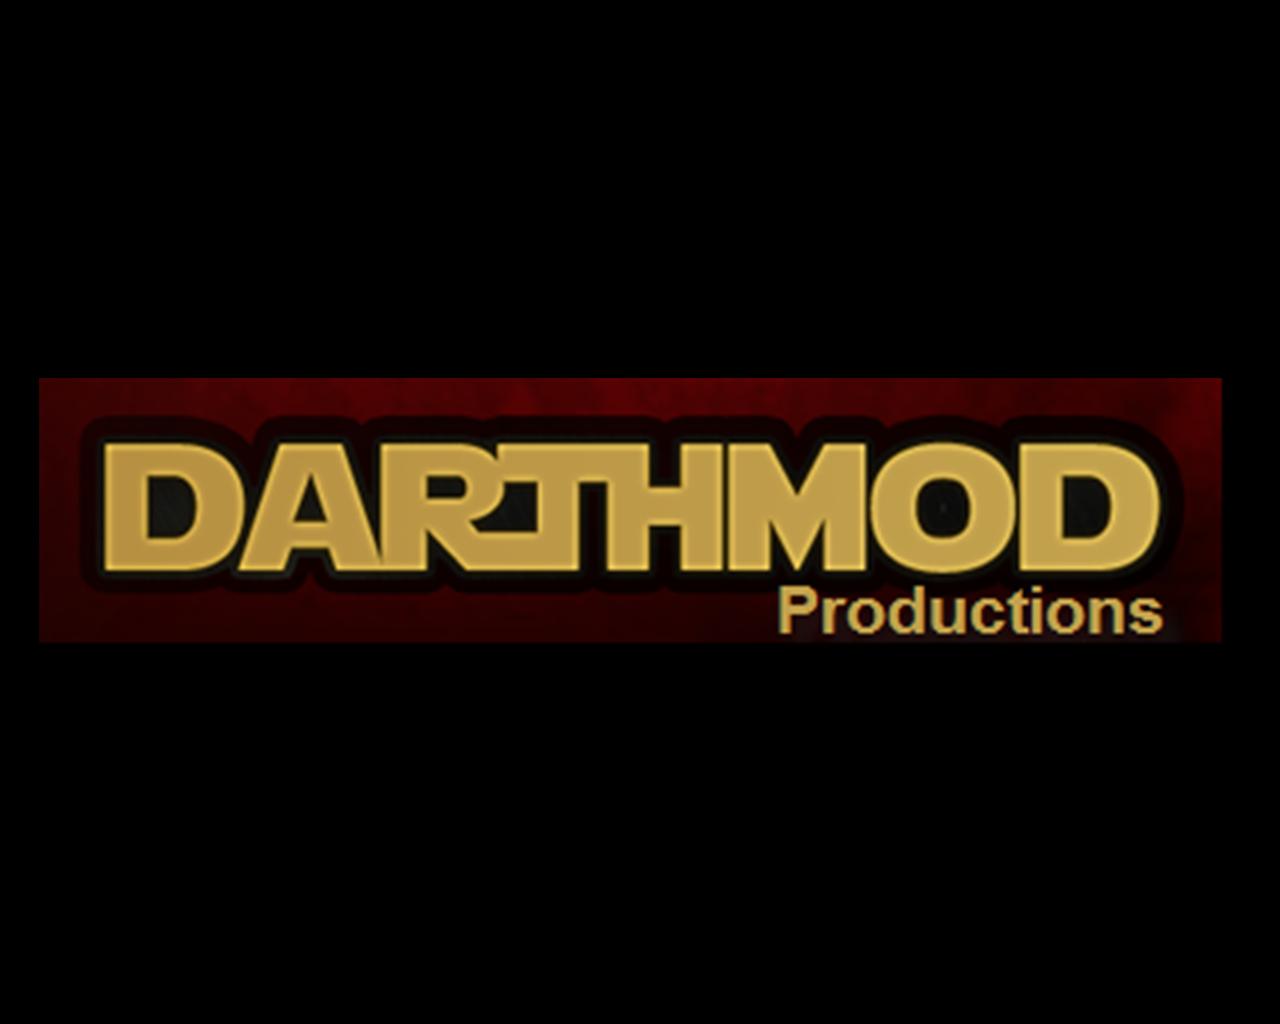 DarthMod Productions